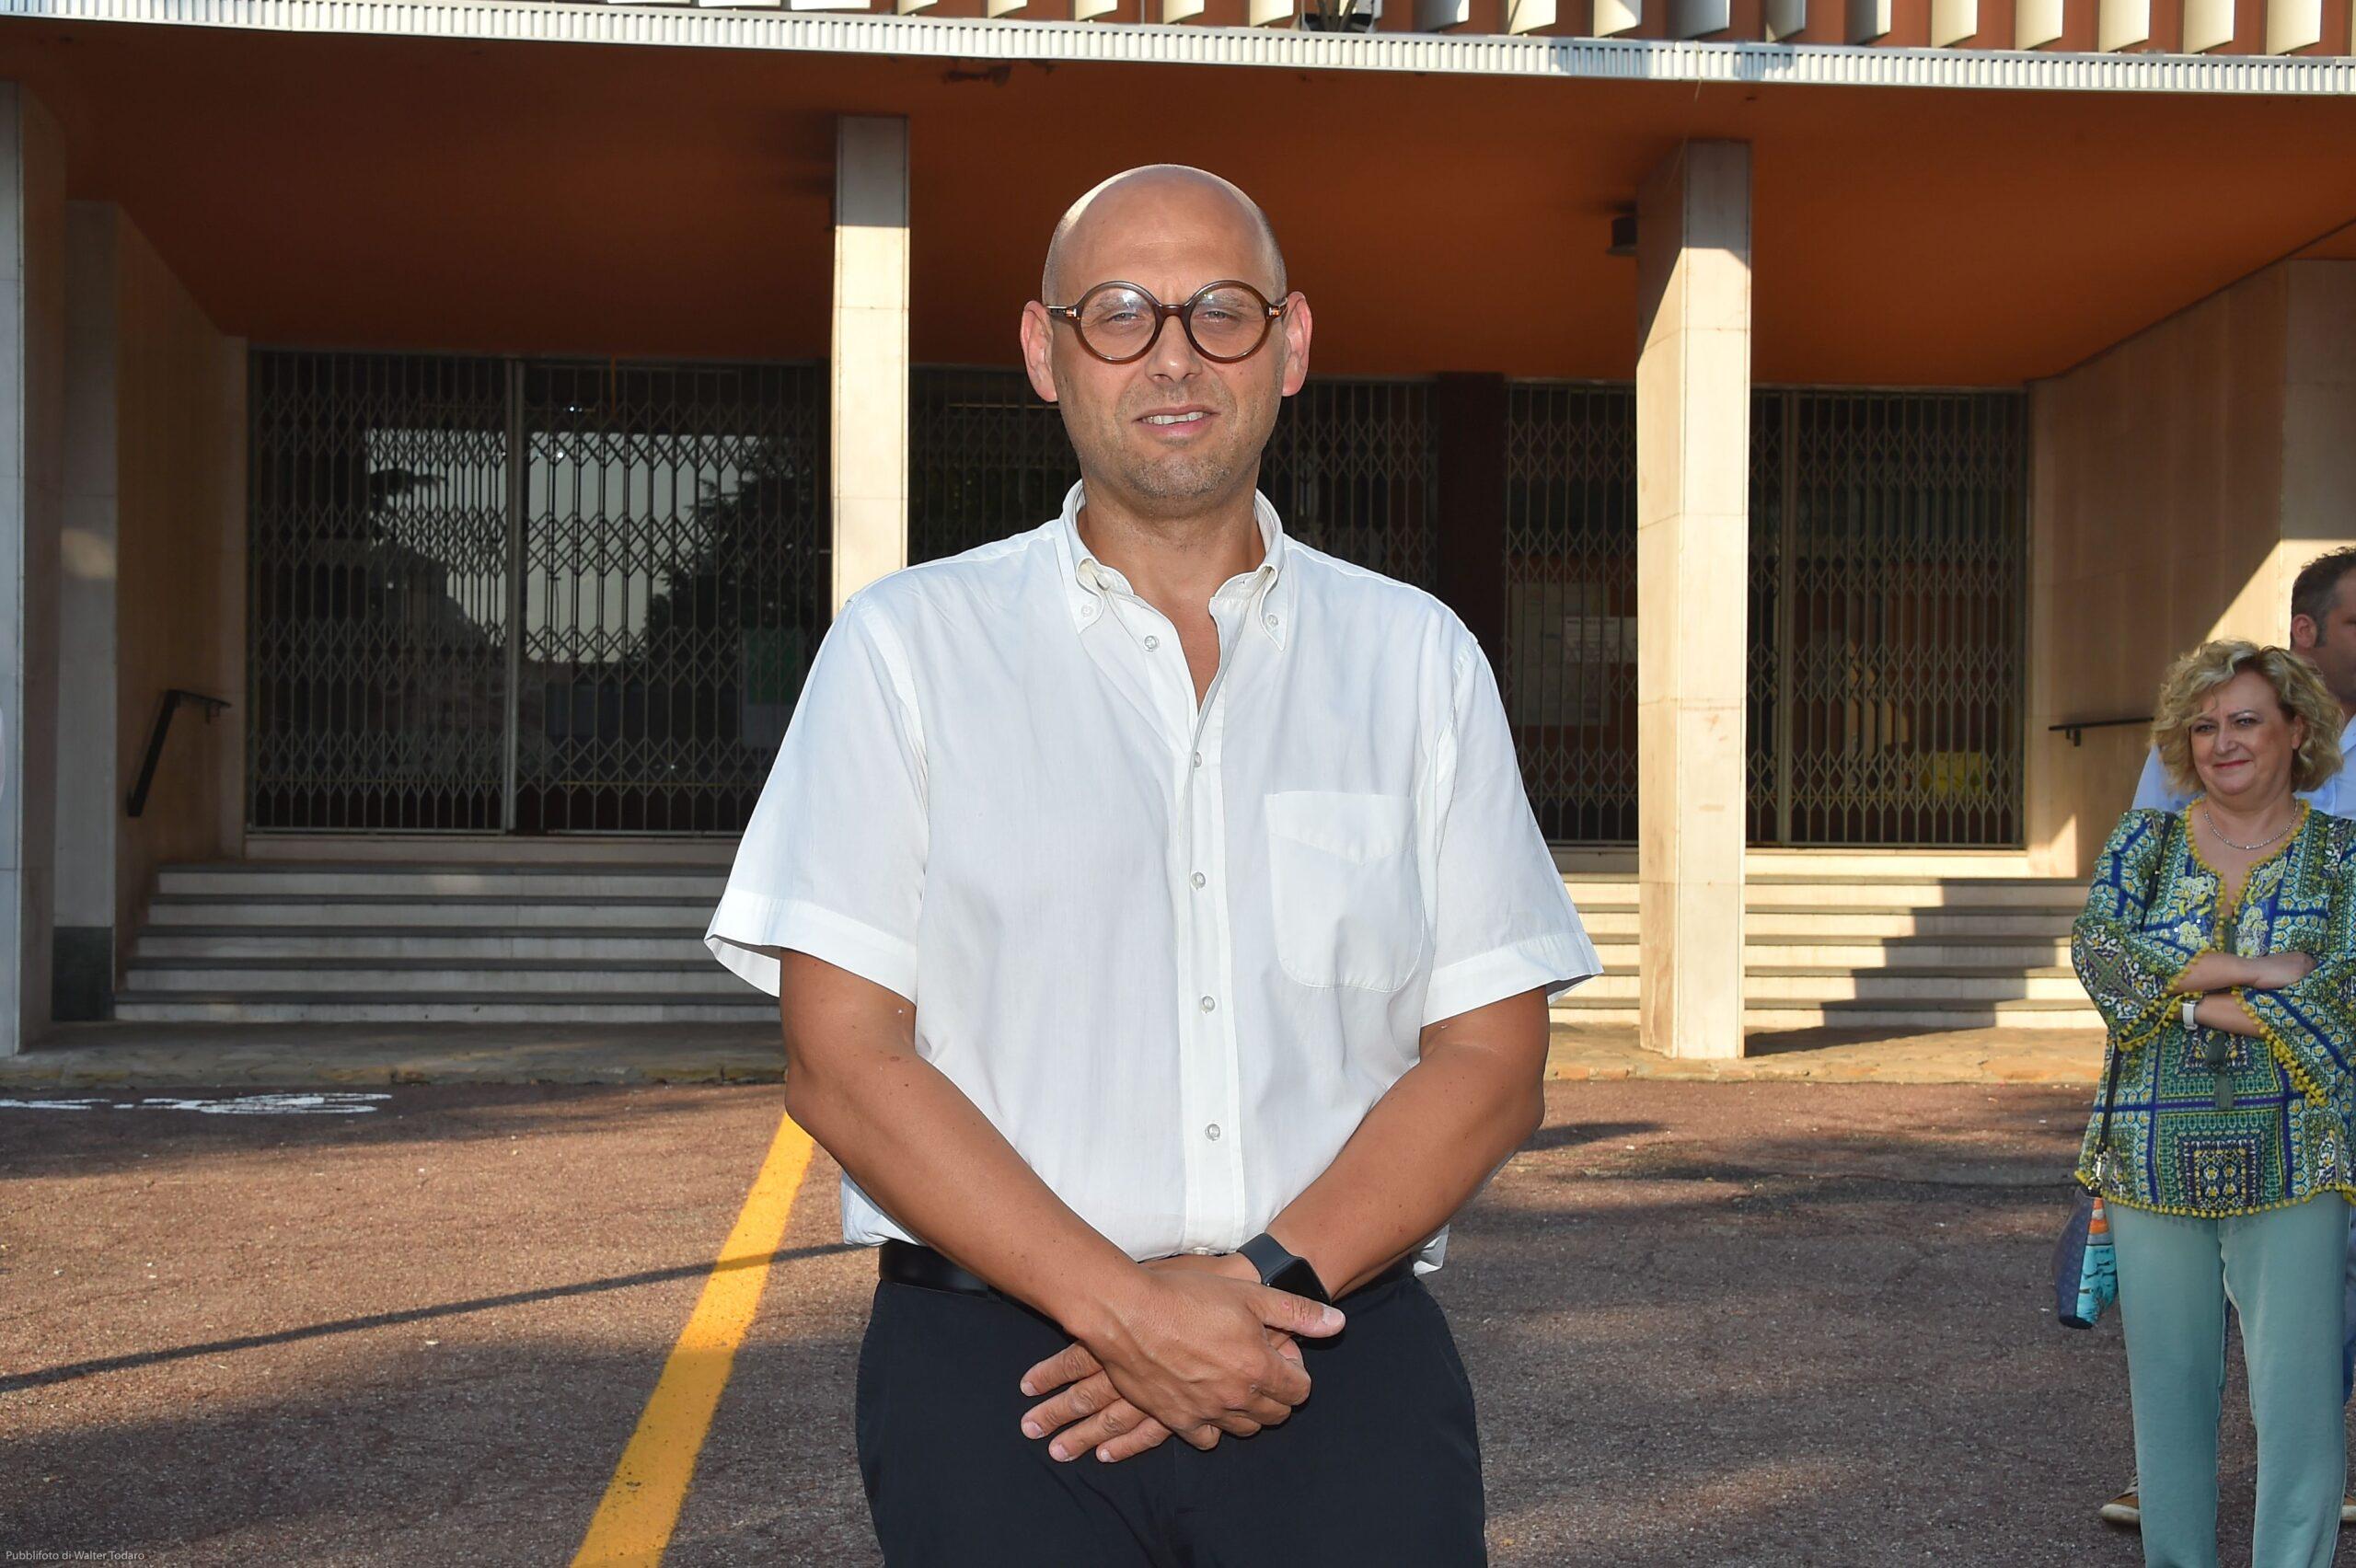 Elezioni Parabiago candidato sindaco Cucchi